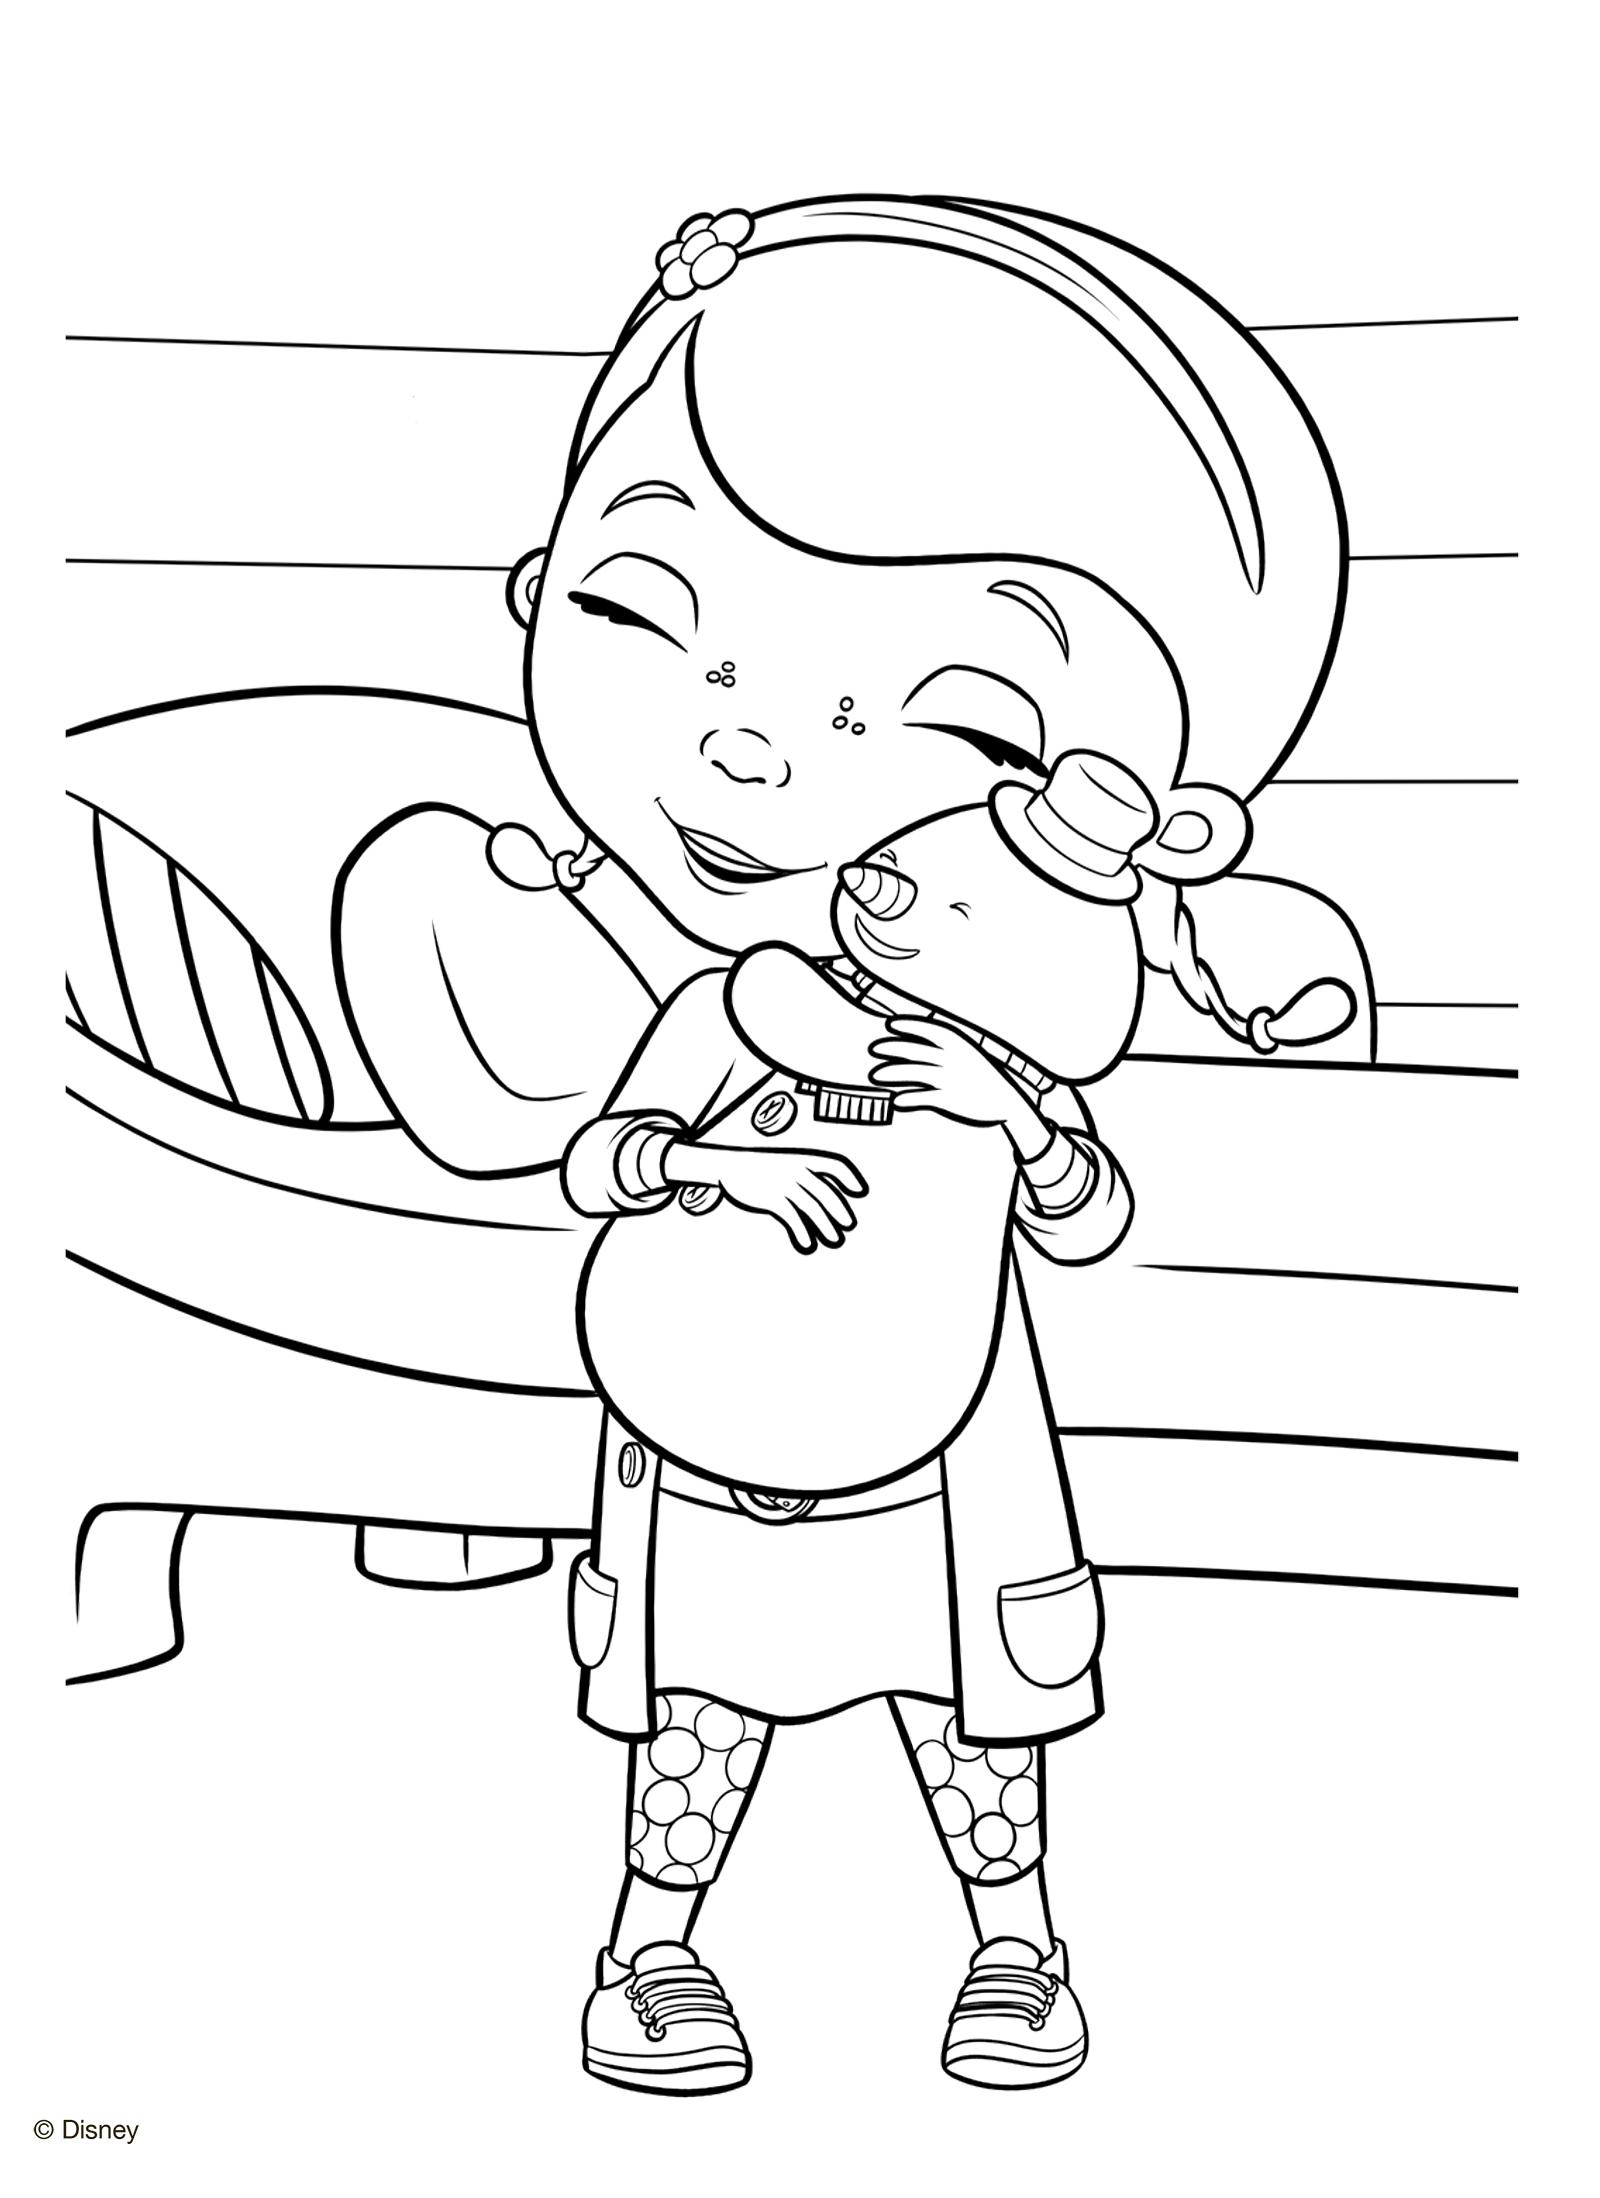 раскраска доктор плюшева и снеговик чилли раскраски доктор